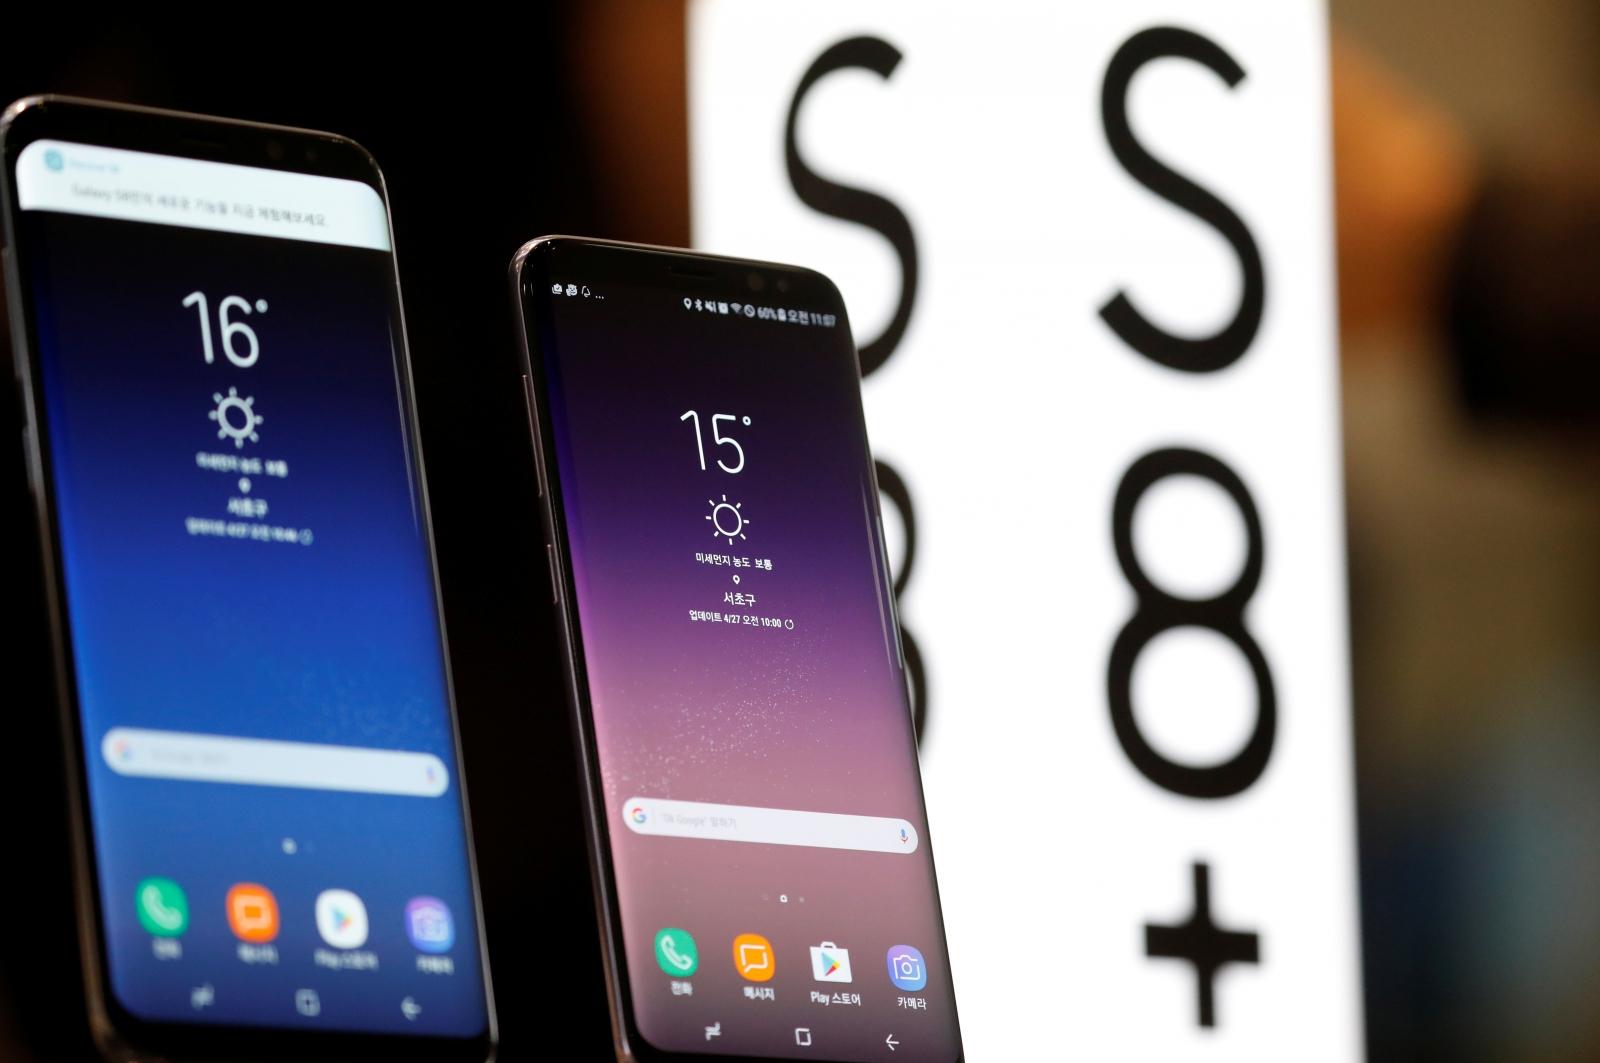 Samsung sells 5 million Galaxy S8 units